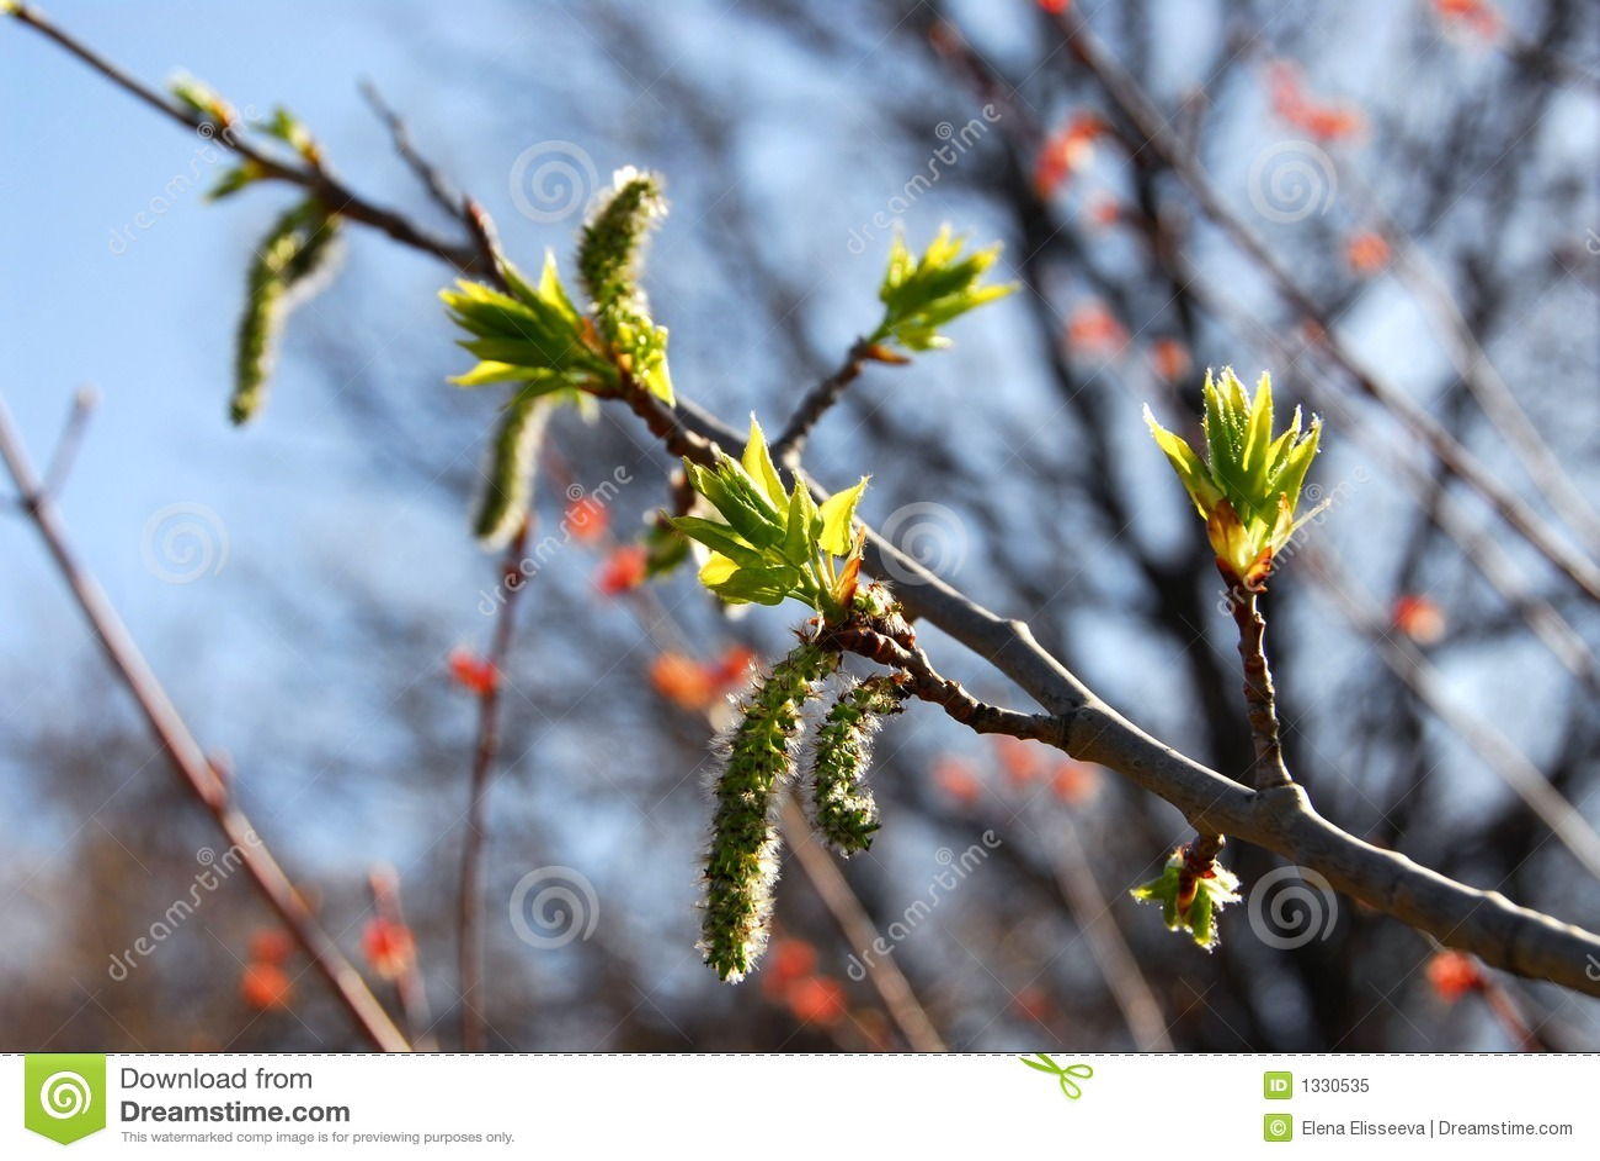 Budding leaves spring